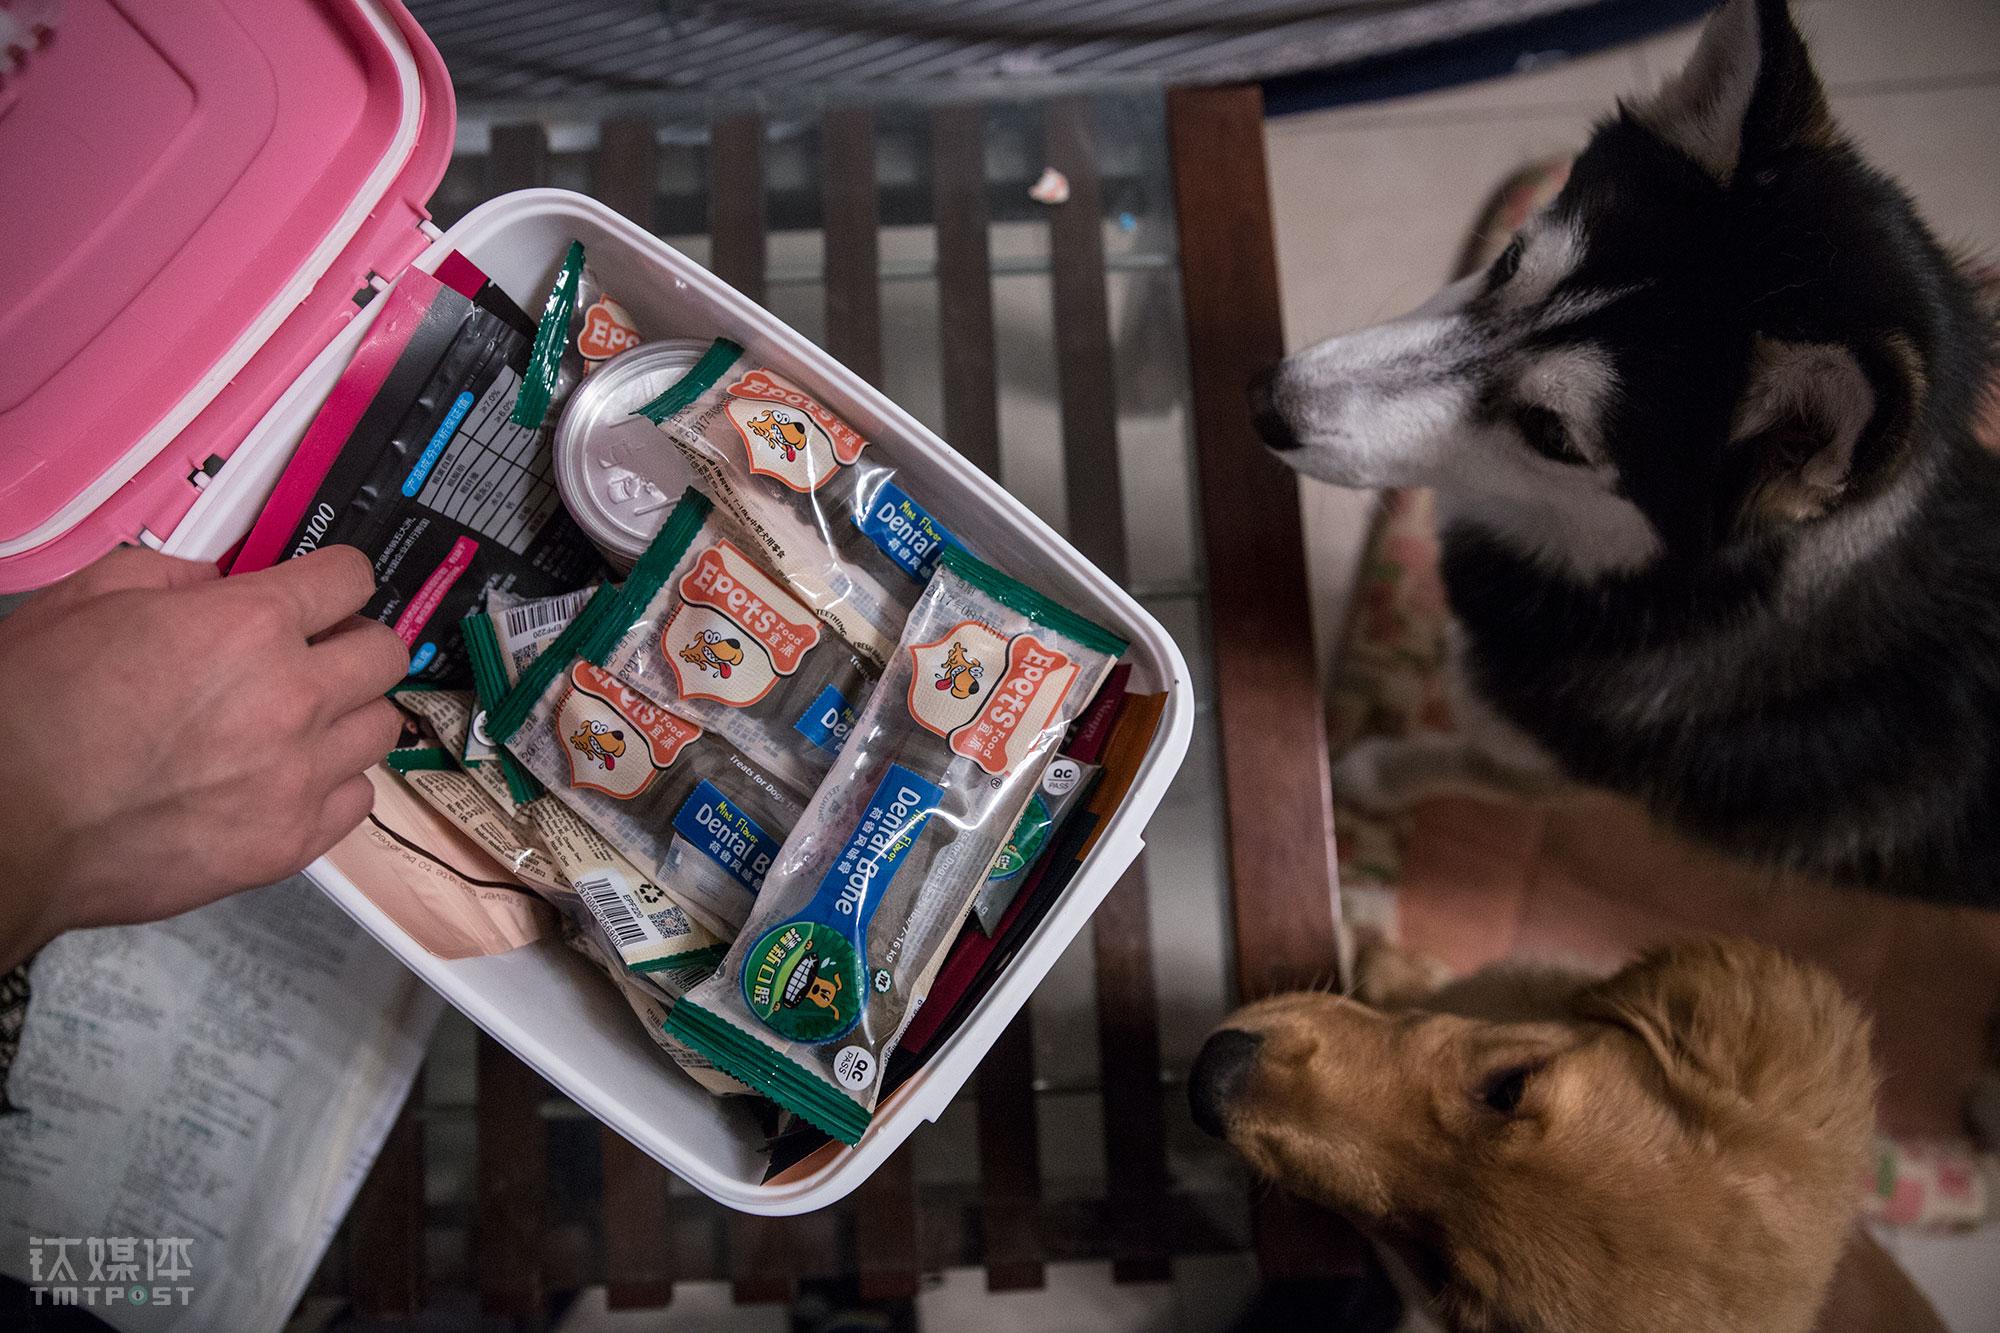 Summer和多宝在等待老徐给他们发零食。老徐家每个月花在这两只狗身上的日常开销大约2000元。